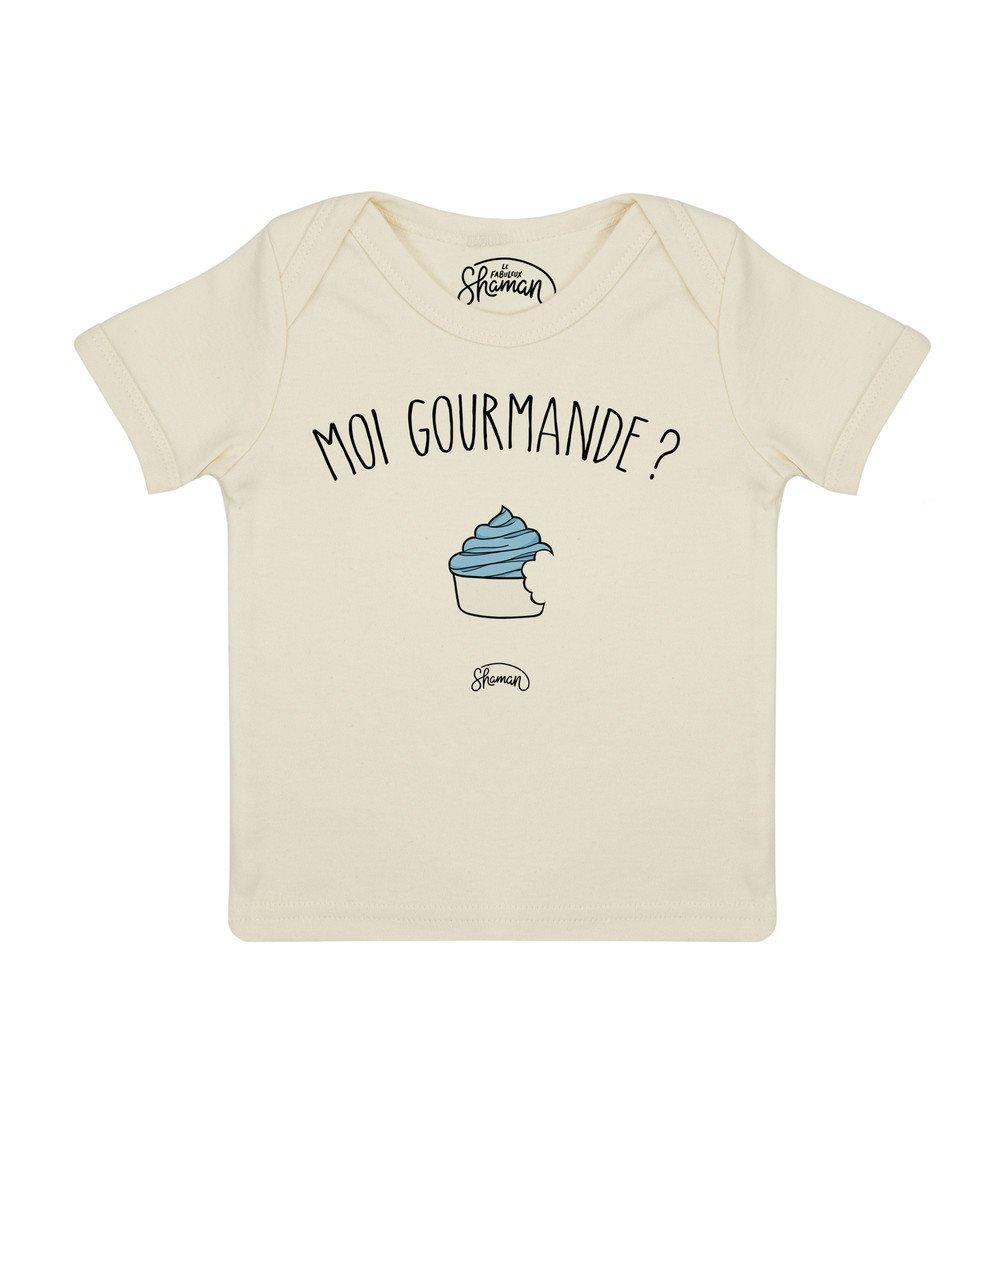 Tee shirt Moi gourmande